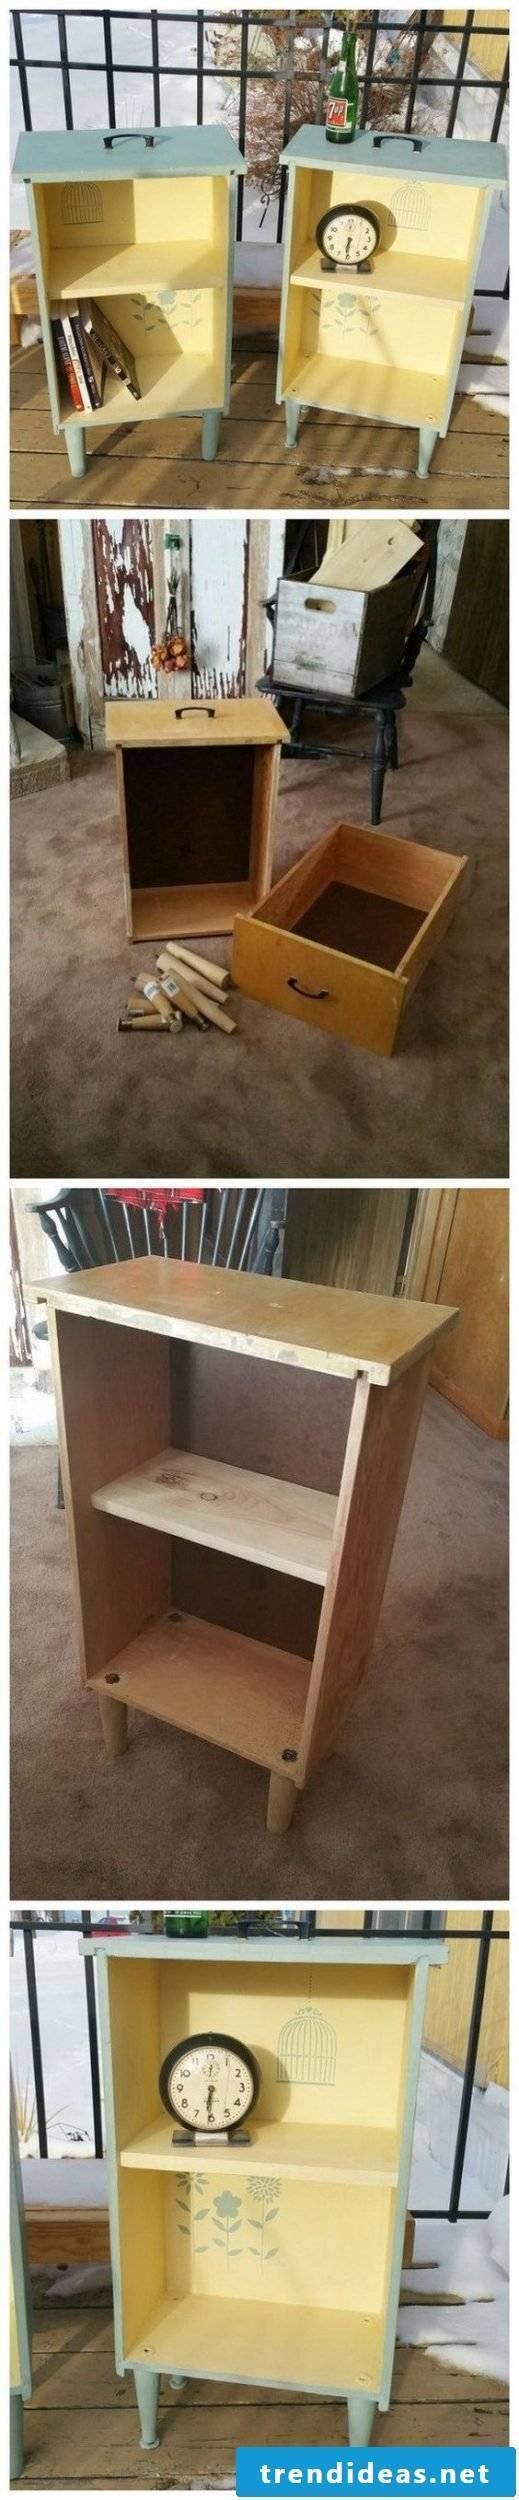 Build DIY furniture yourself